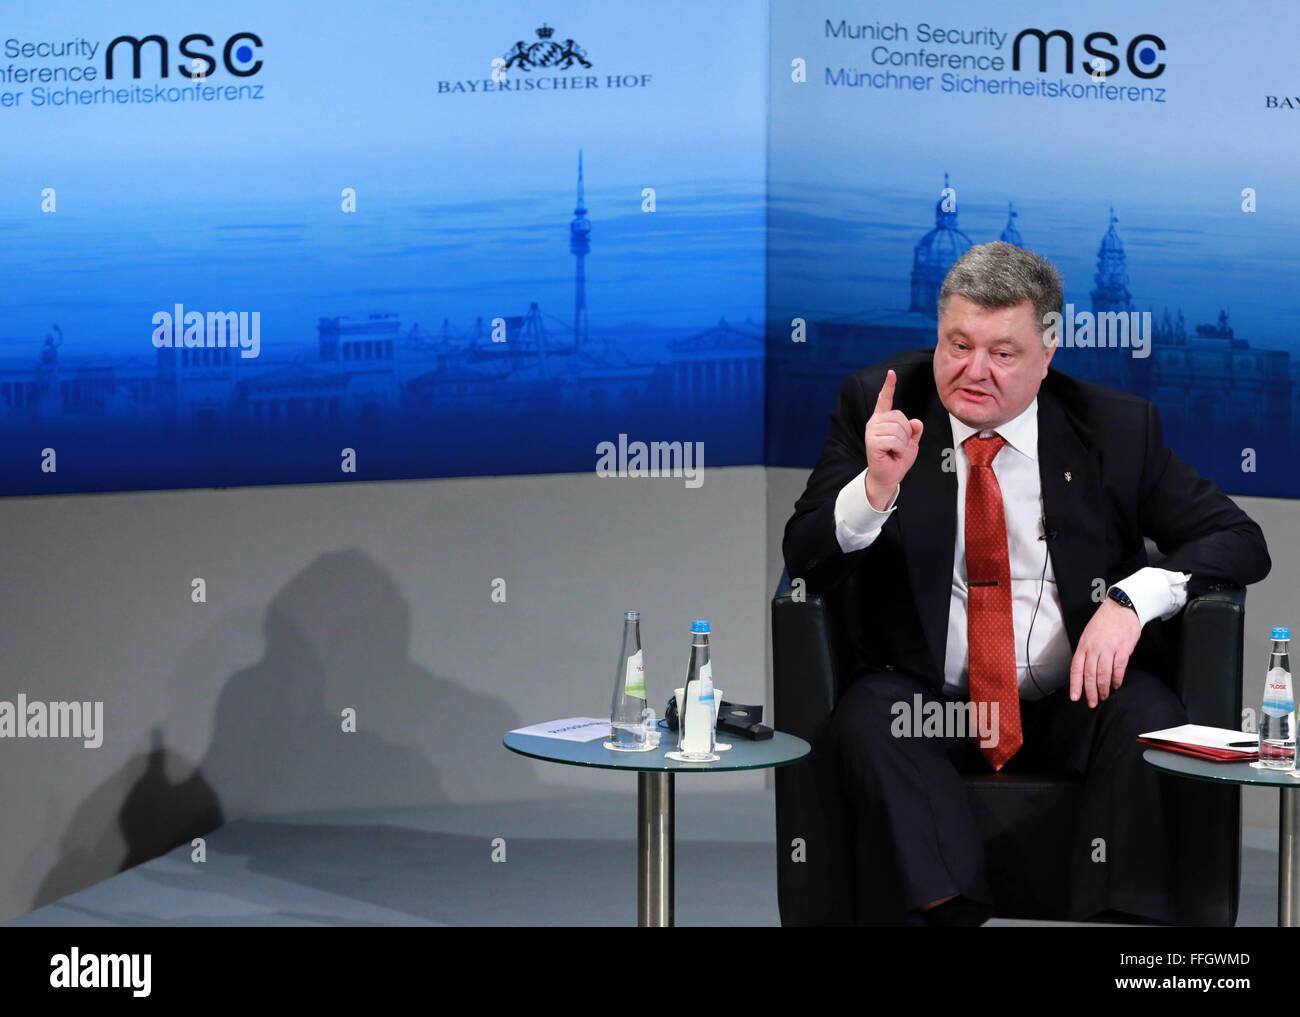 Munich, Germany. 13th Feb, 2016. Ukraine's President Petro Poroshenko attends the Munich Security Conference(MSC) - Stock Image